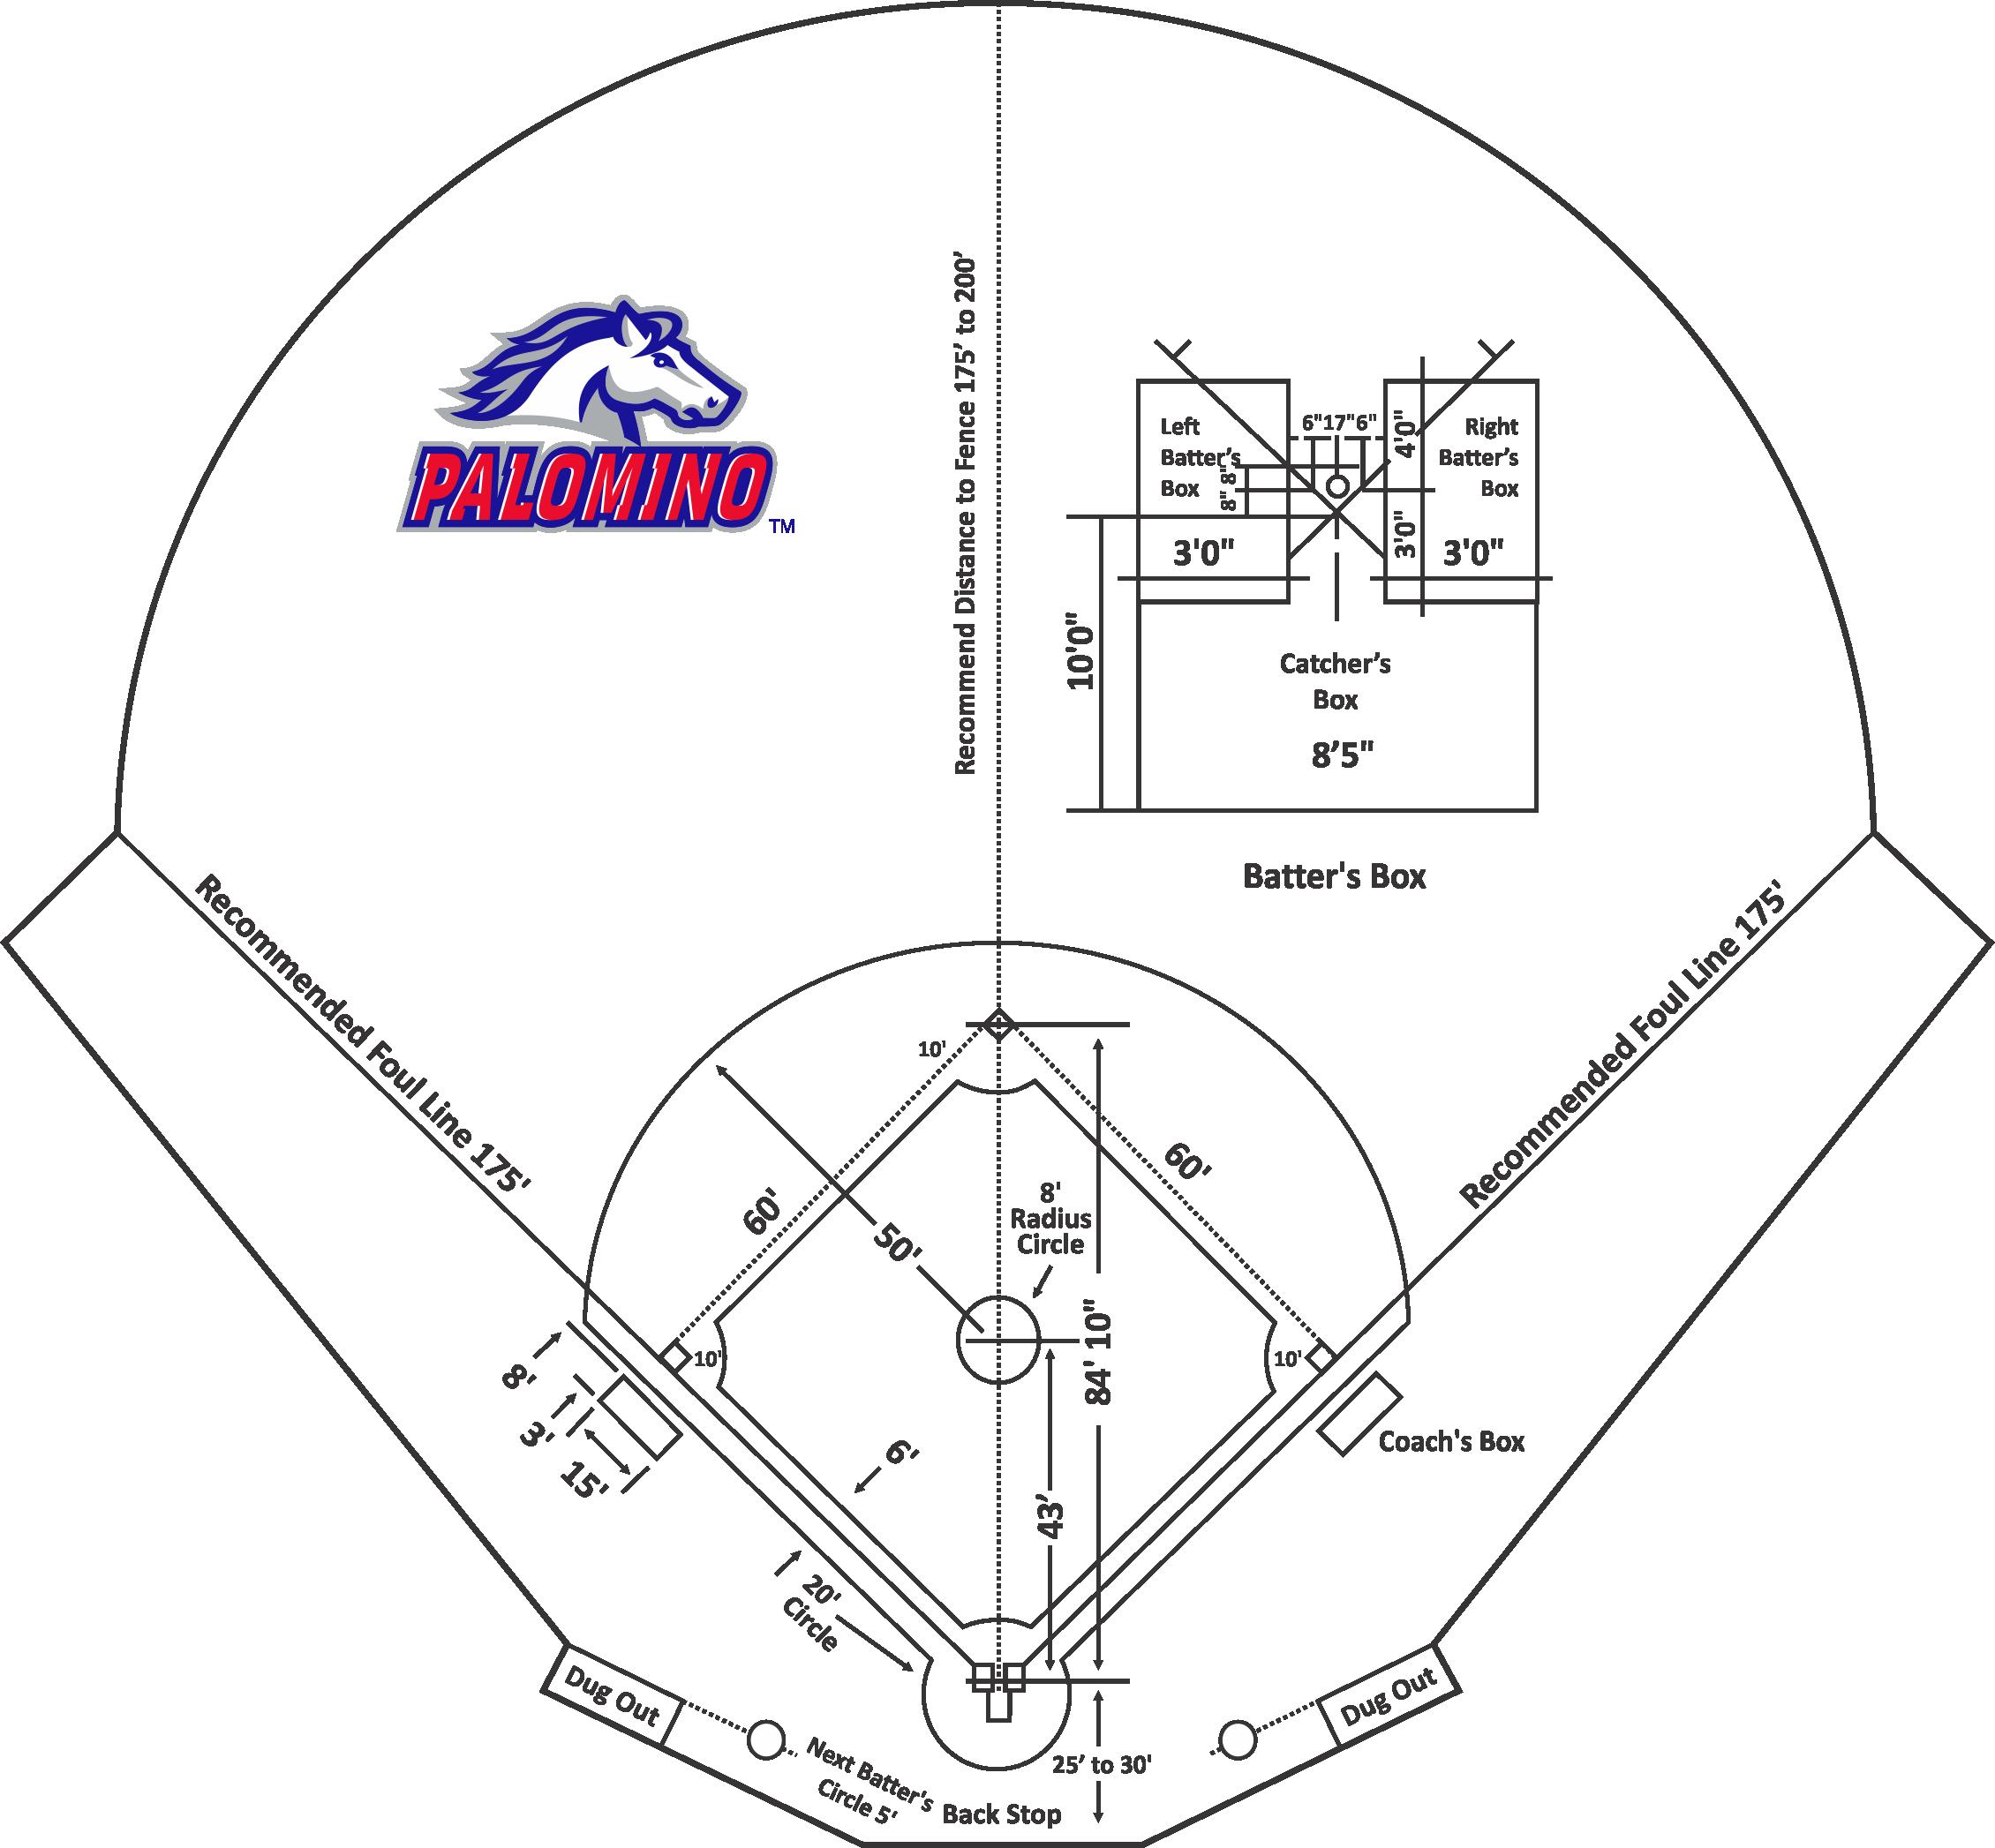 Baseball Field Diagram Field Diagram Travelselect Palomino 18 Softball Pony Baseball